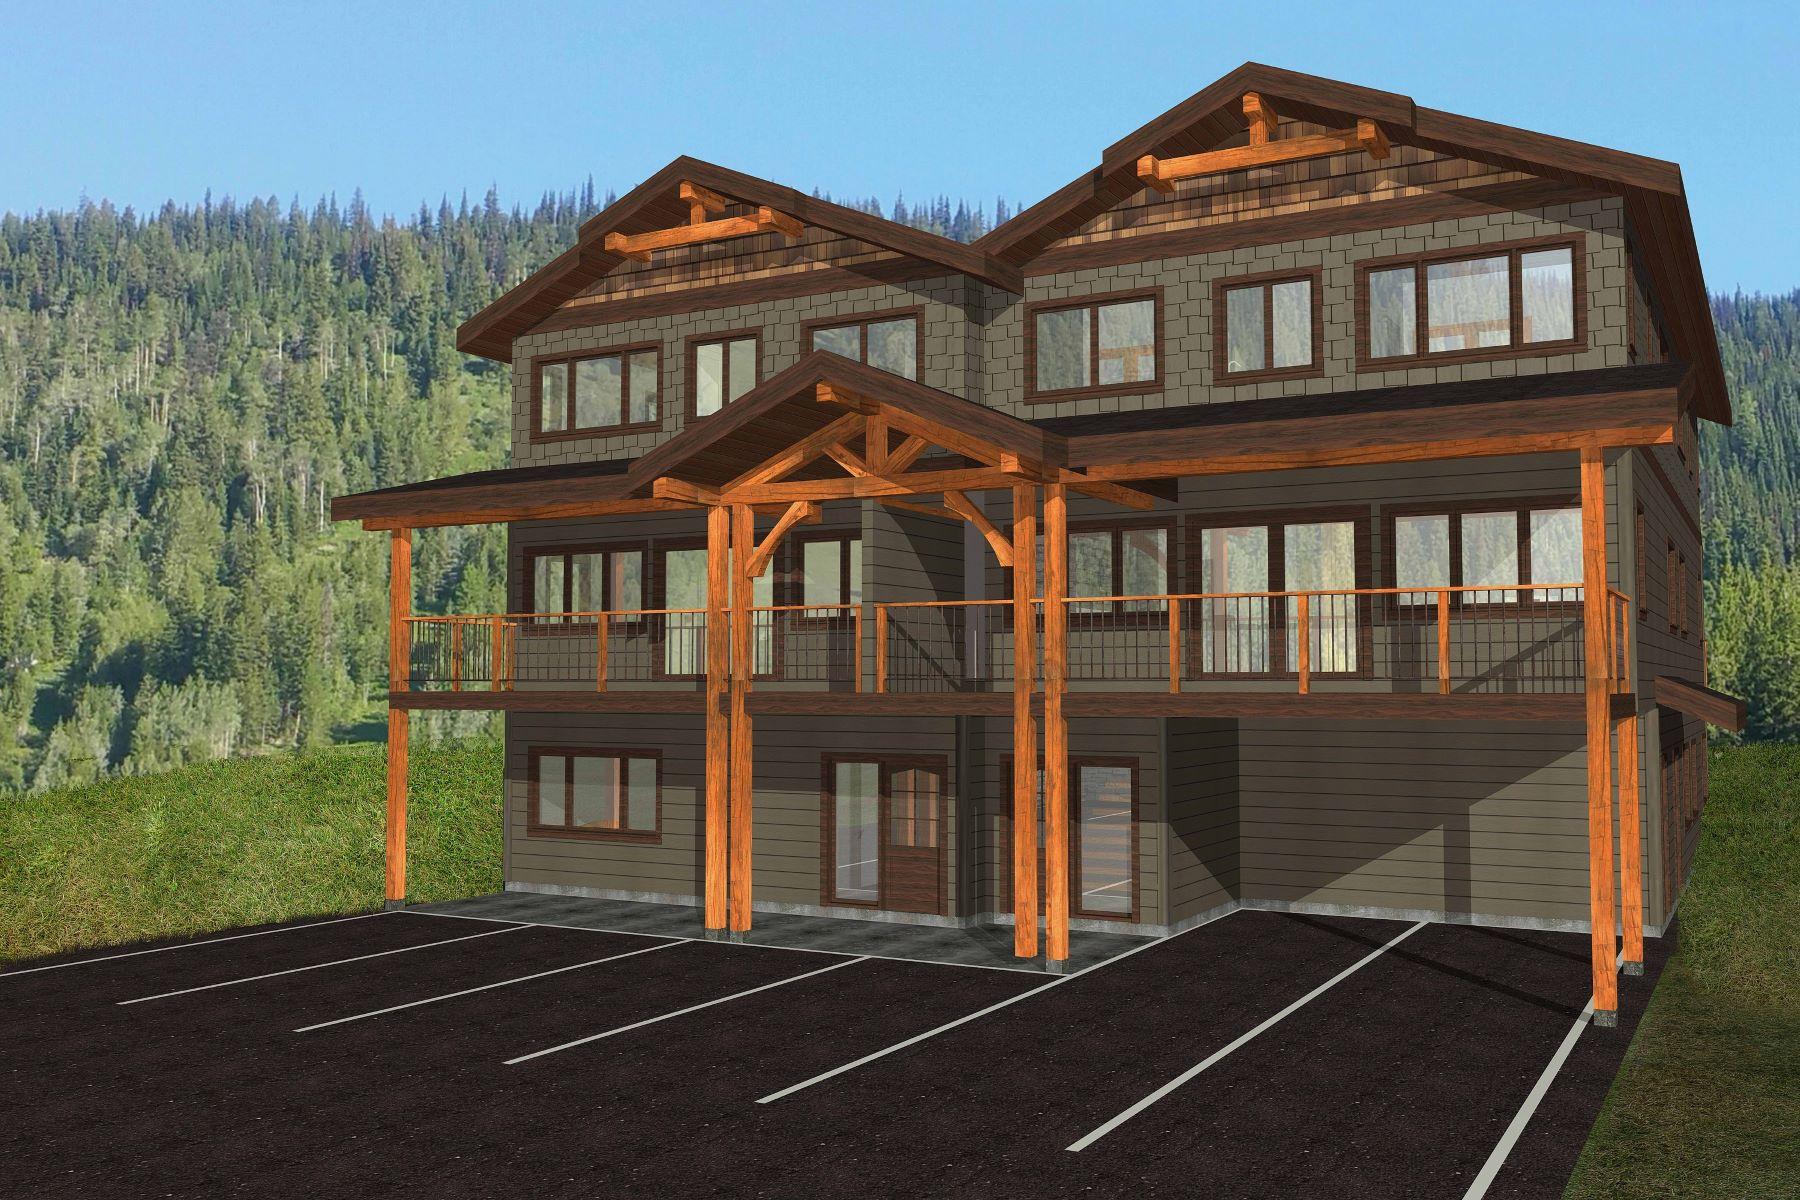 共管物業 為 出售 在 New 3 Bedroom Condo 4-1305 Burfield Drive, Sun Peaks, 不列顛哥倫比亞省, V0E 5N0 加拿大